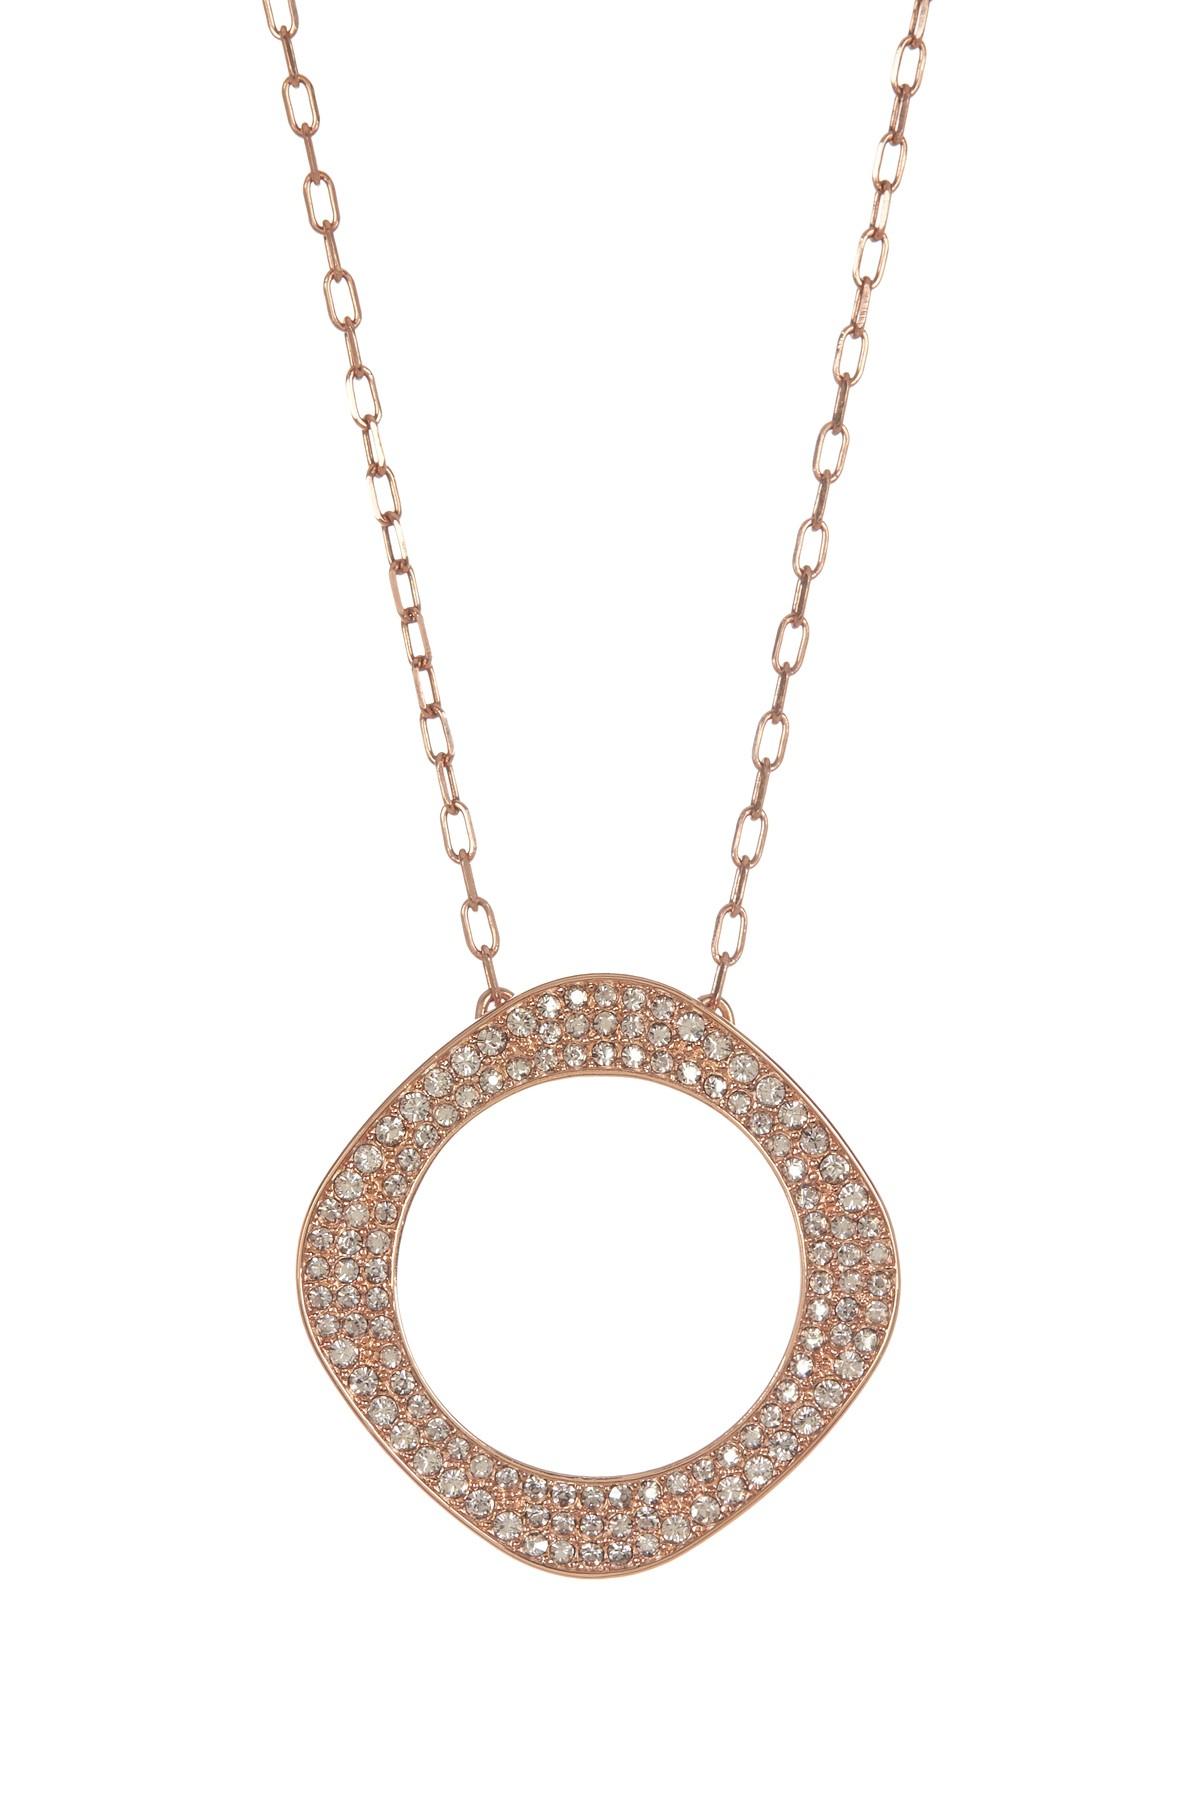 Lyst swarovski 18k rose gold plated vio crystal pendant for Swarovski jewelry online store